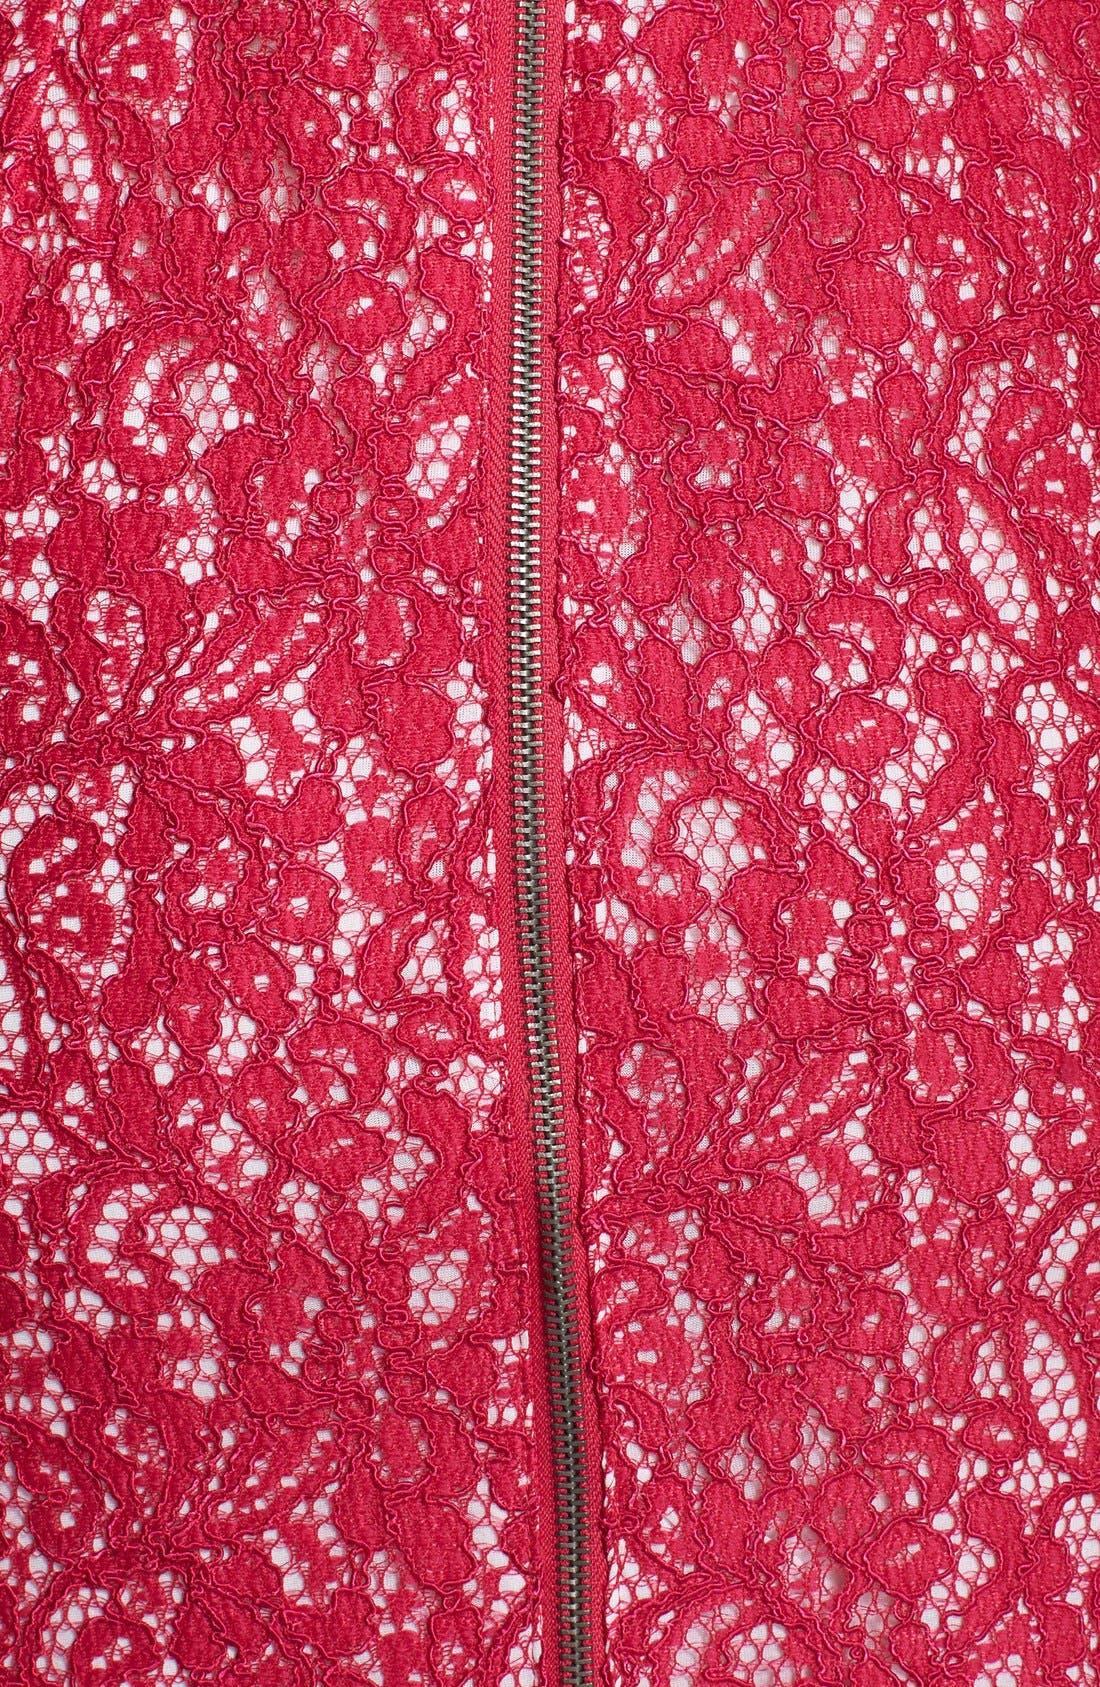 Boatneck Lace Sheath Dress,                             Alternate thumbnail 91, color,